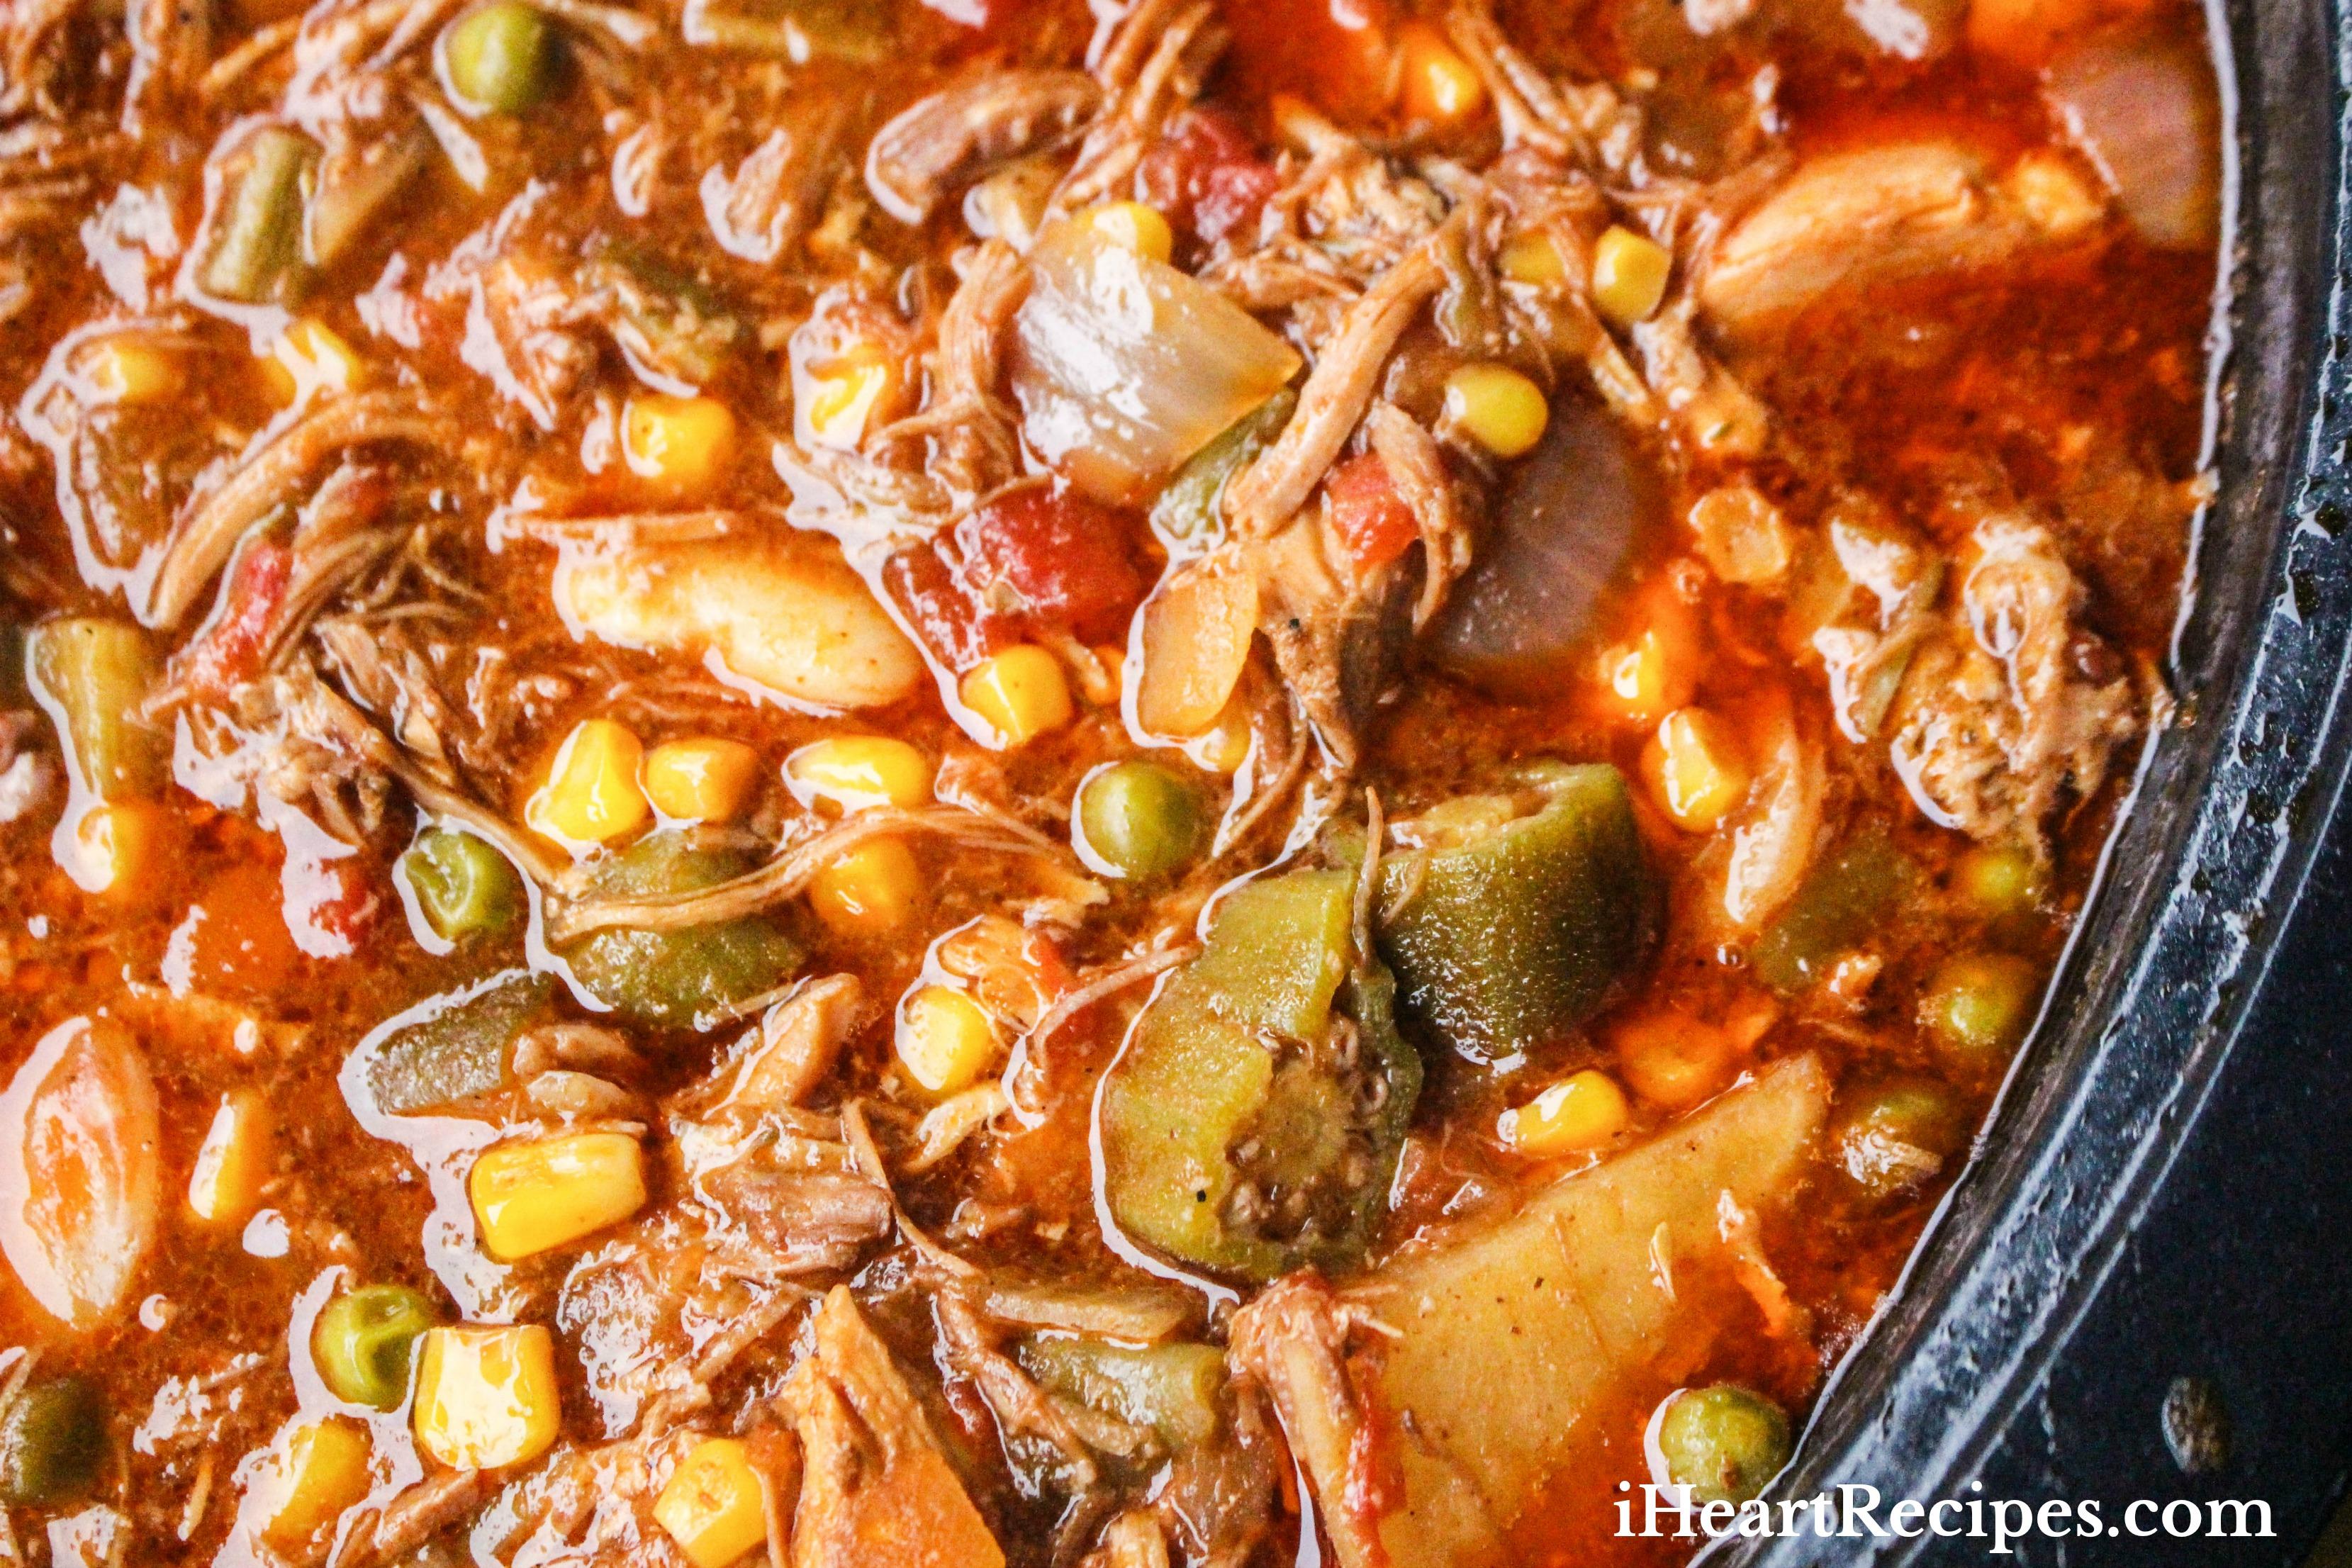 Slow Cooker Brunswick Stew I Heart Recipes